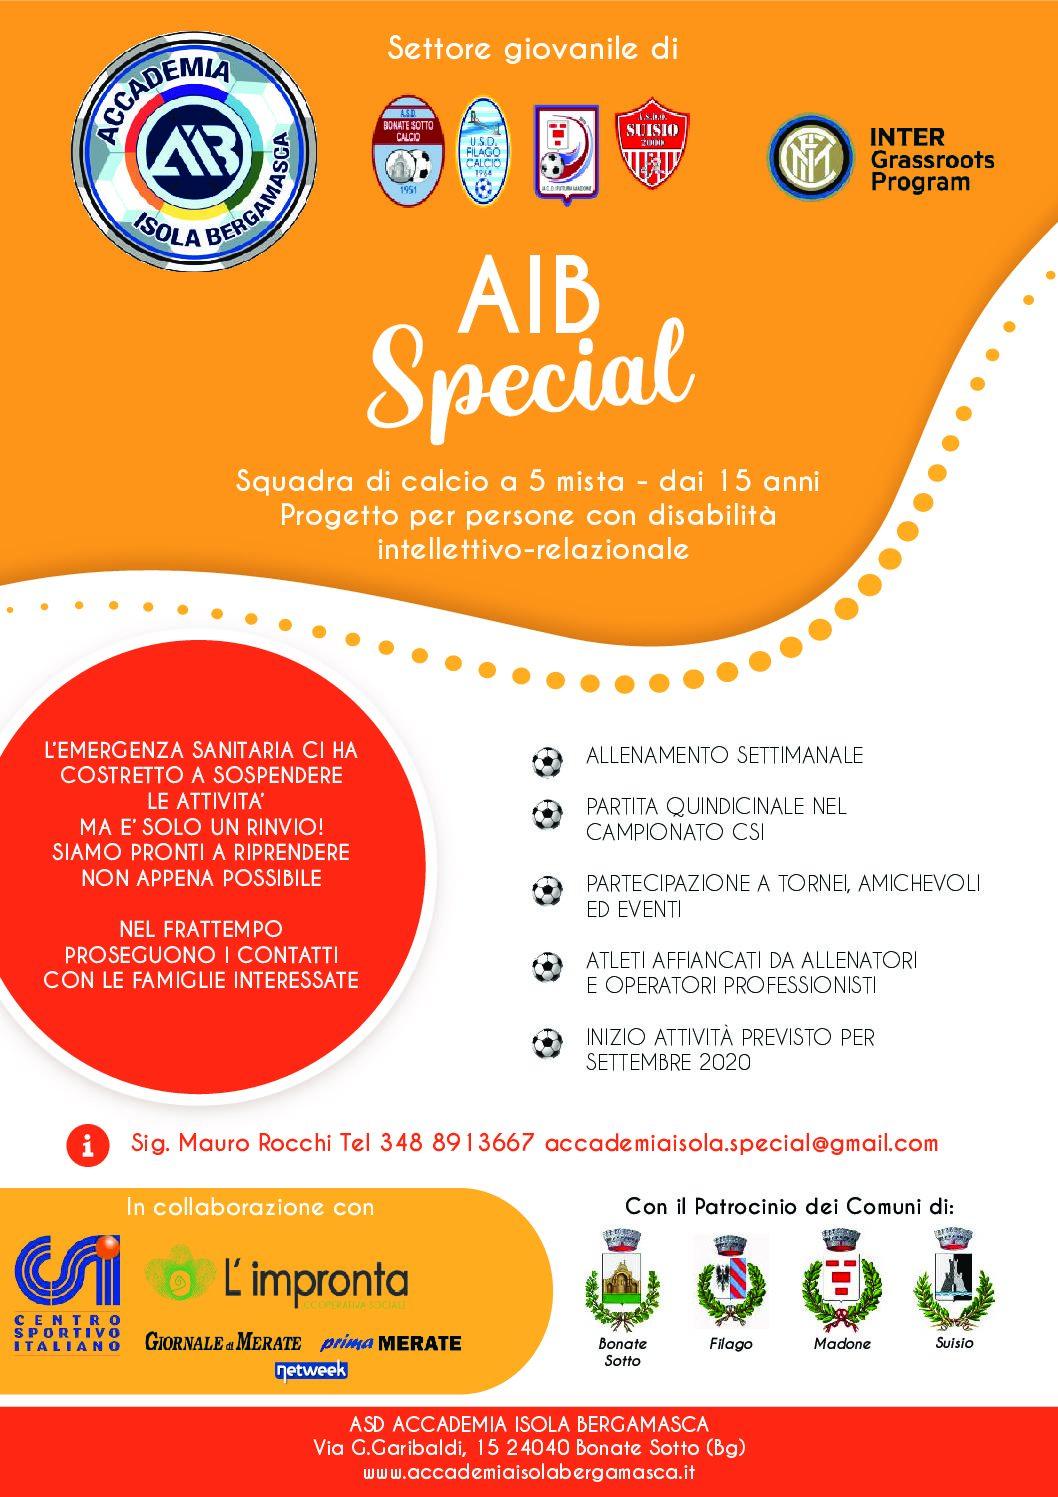 AIB SPECIAL